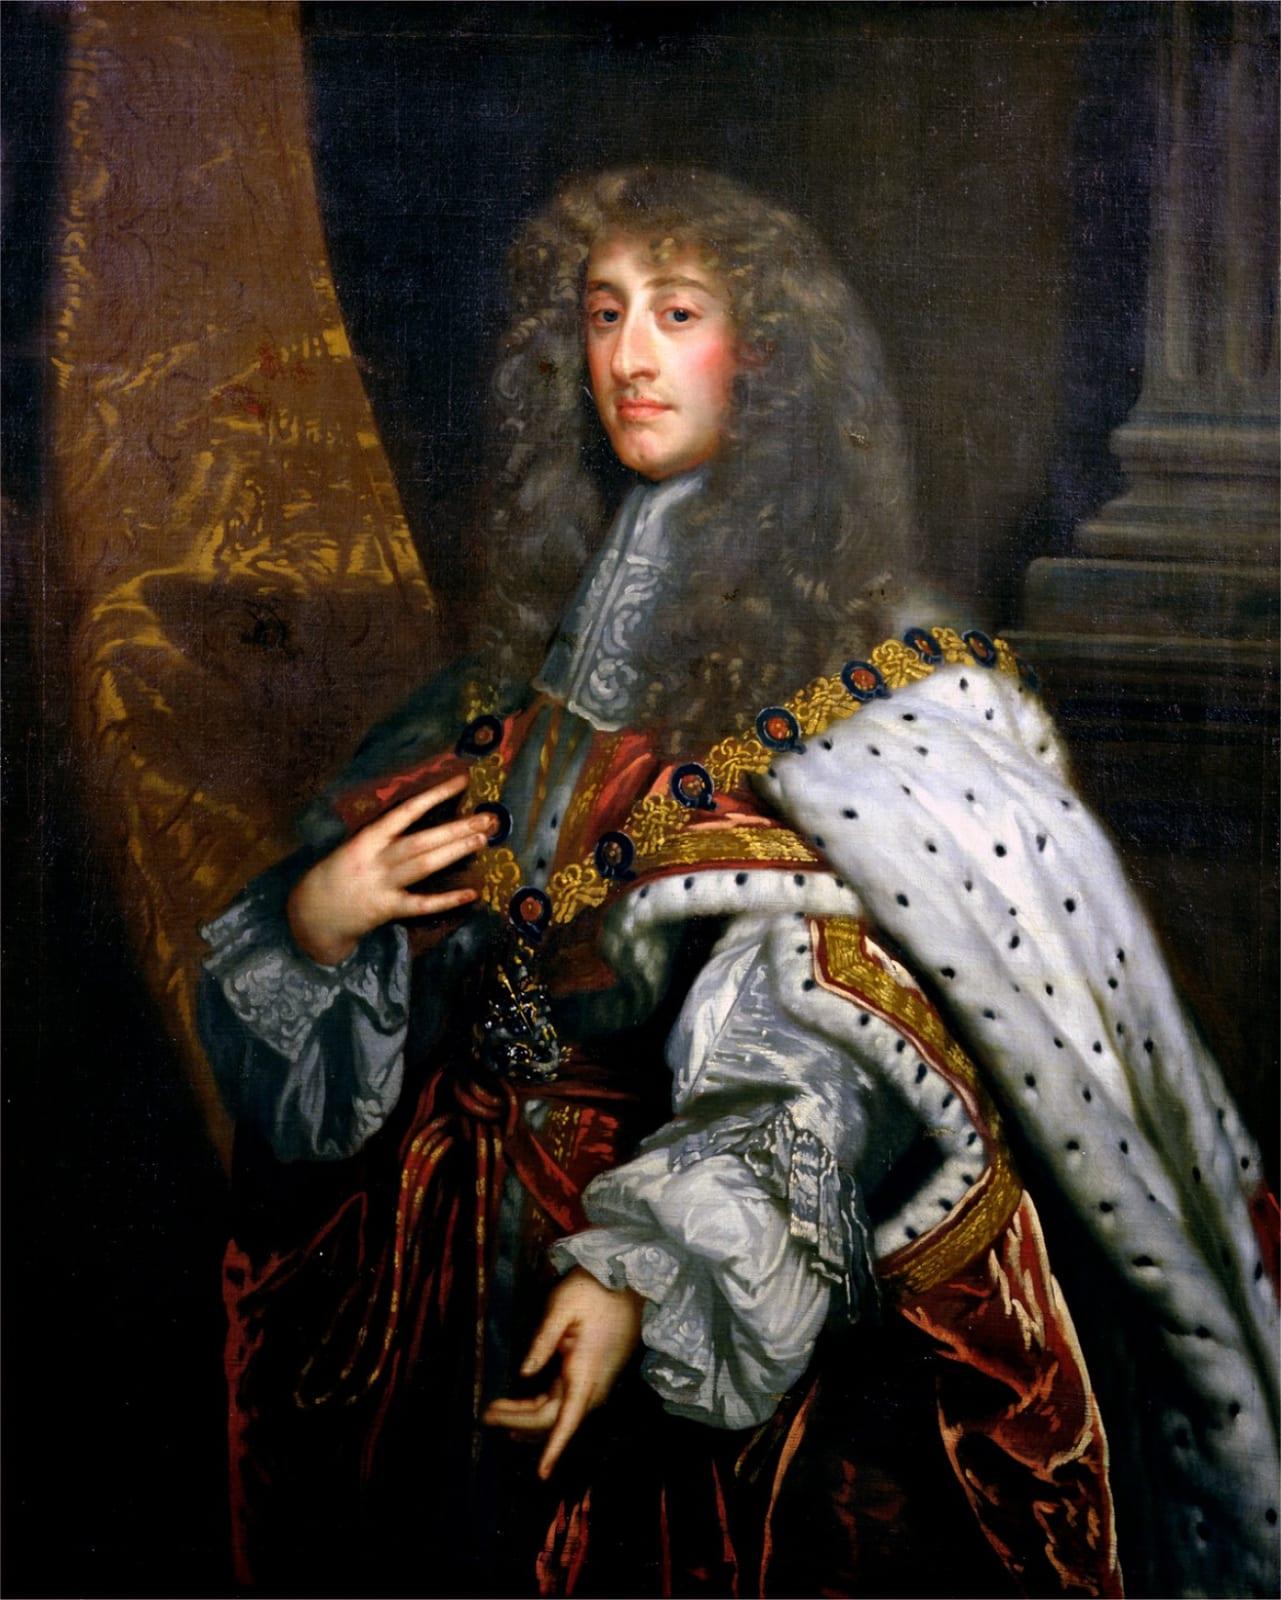 James VII & II (1633 - 1701)